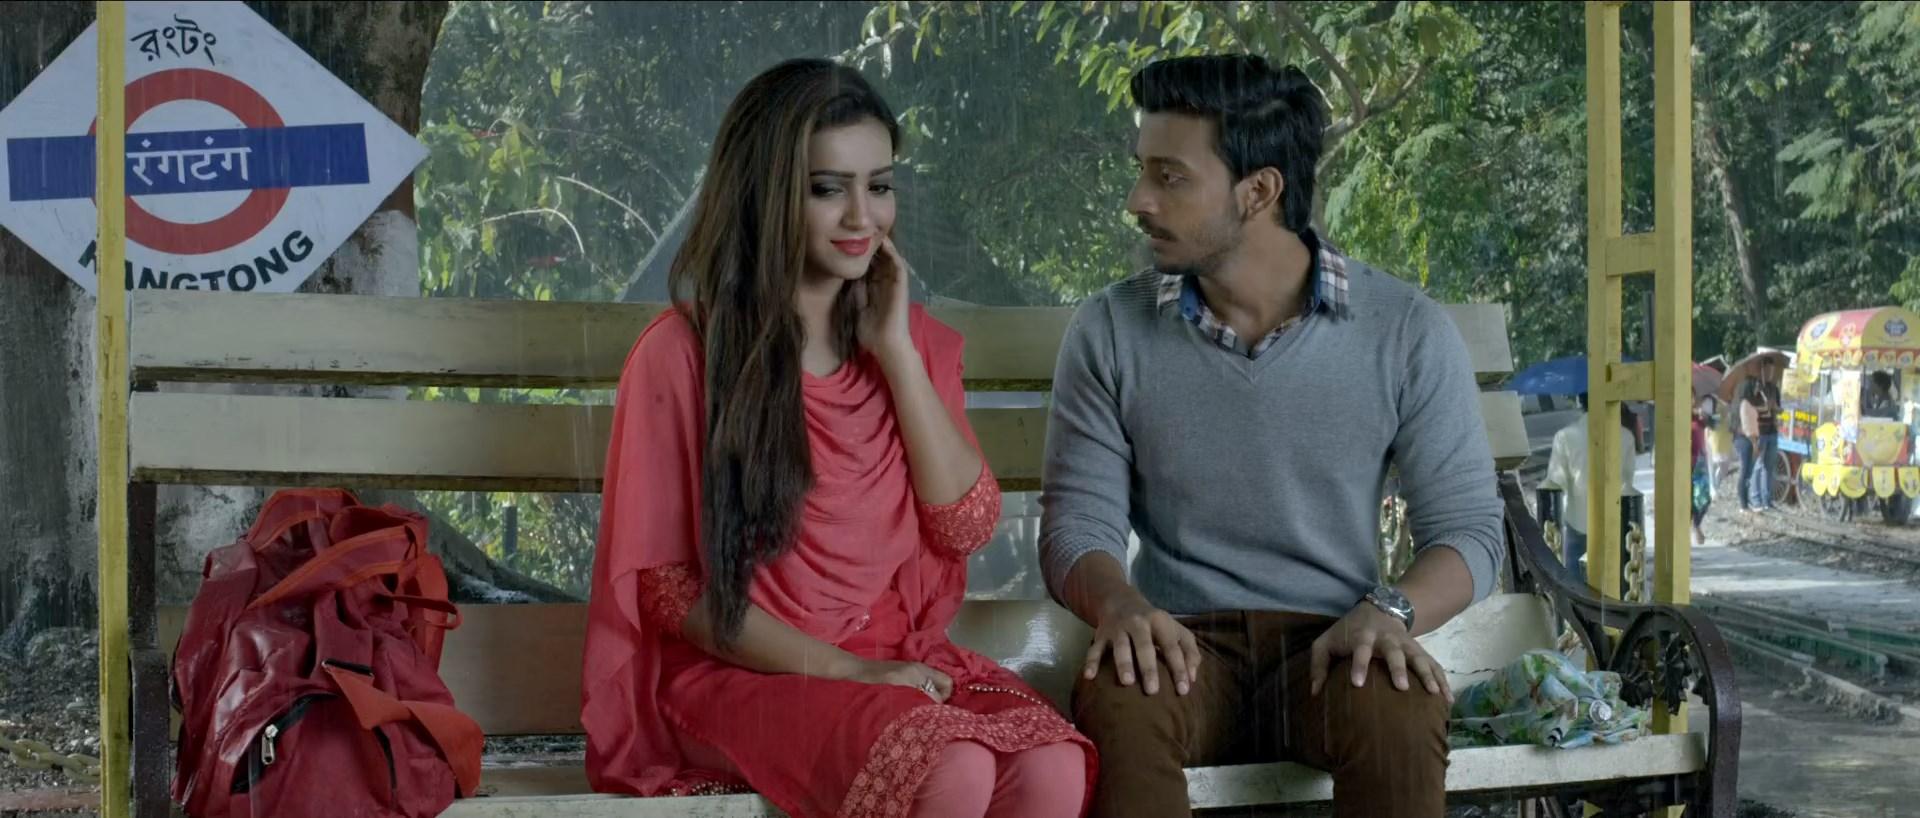 Tomake Chai 2017 Bengali 1080P WEBRiP.mkv snapshot 00.31.13.760